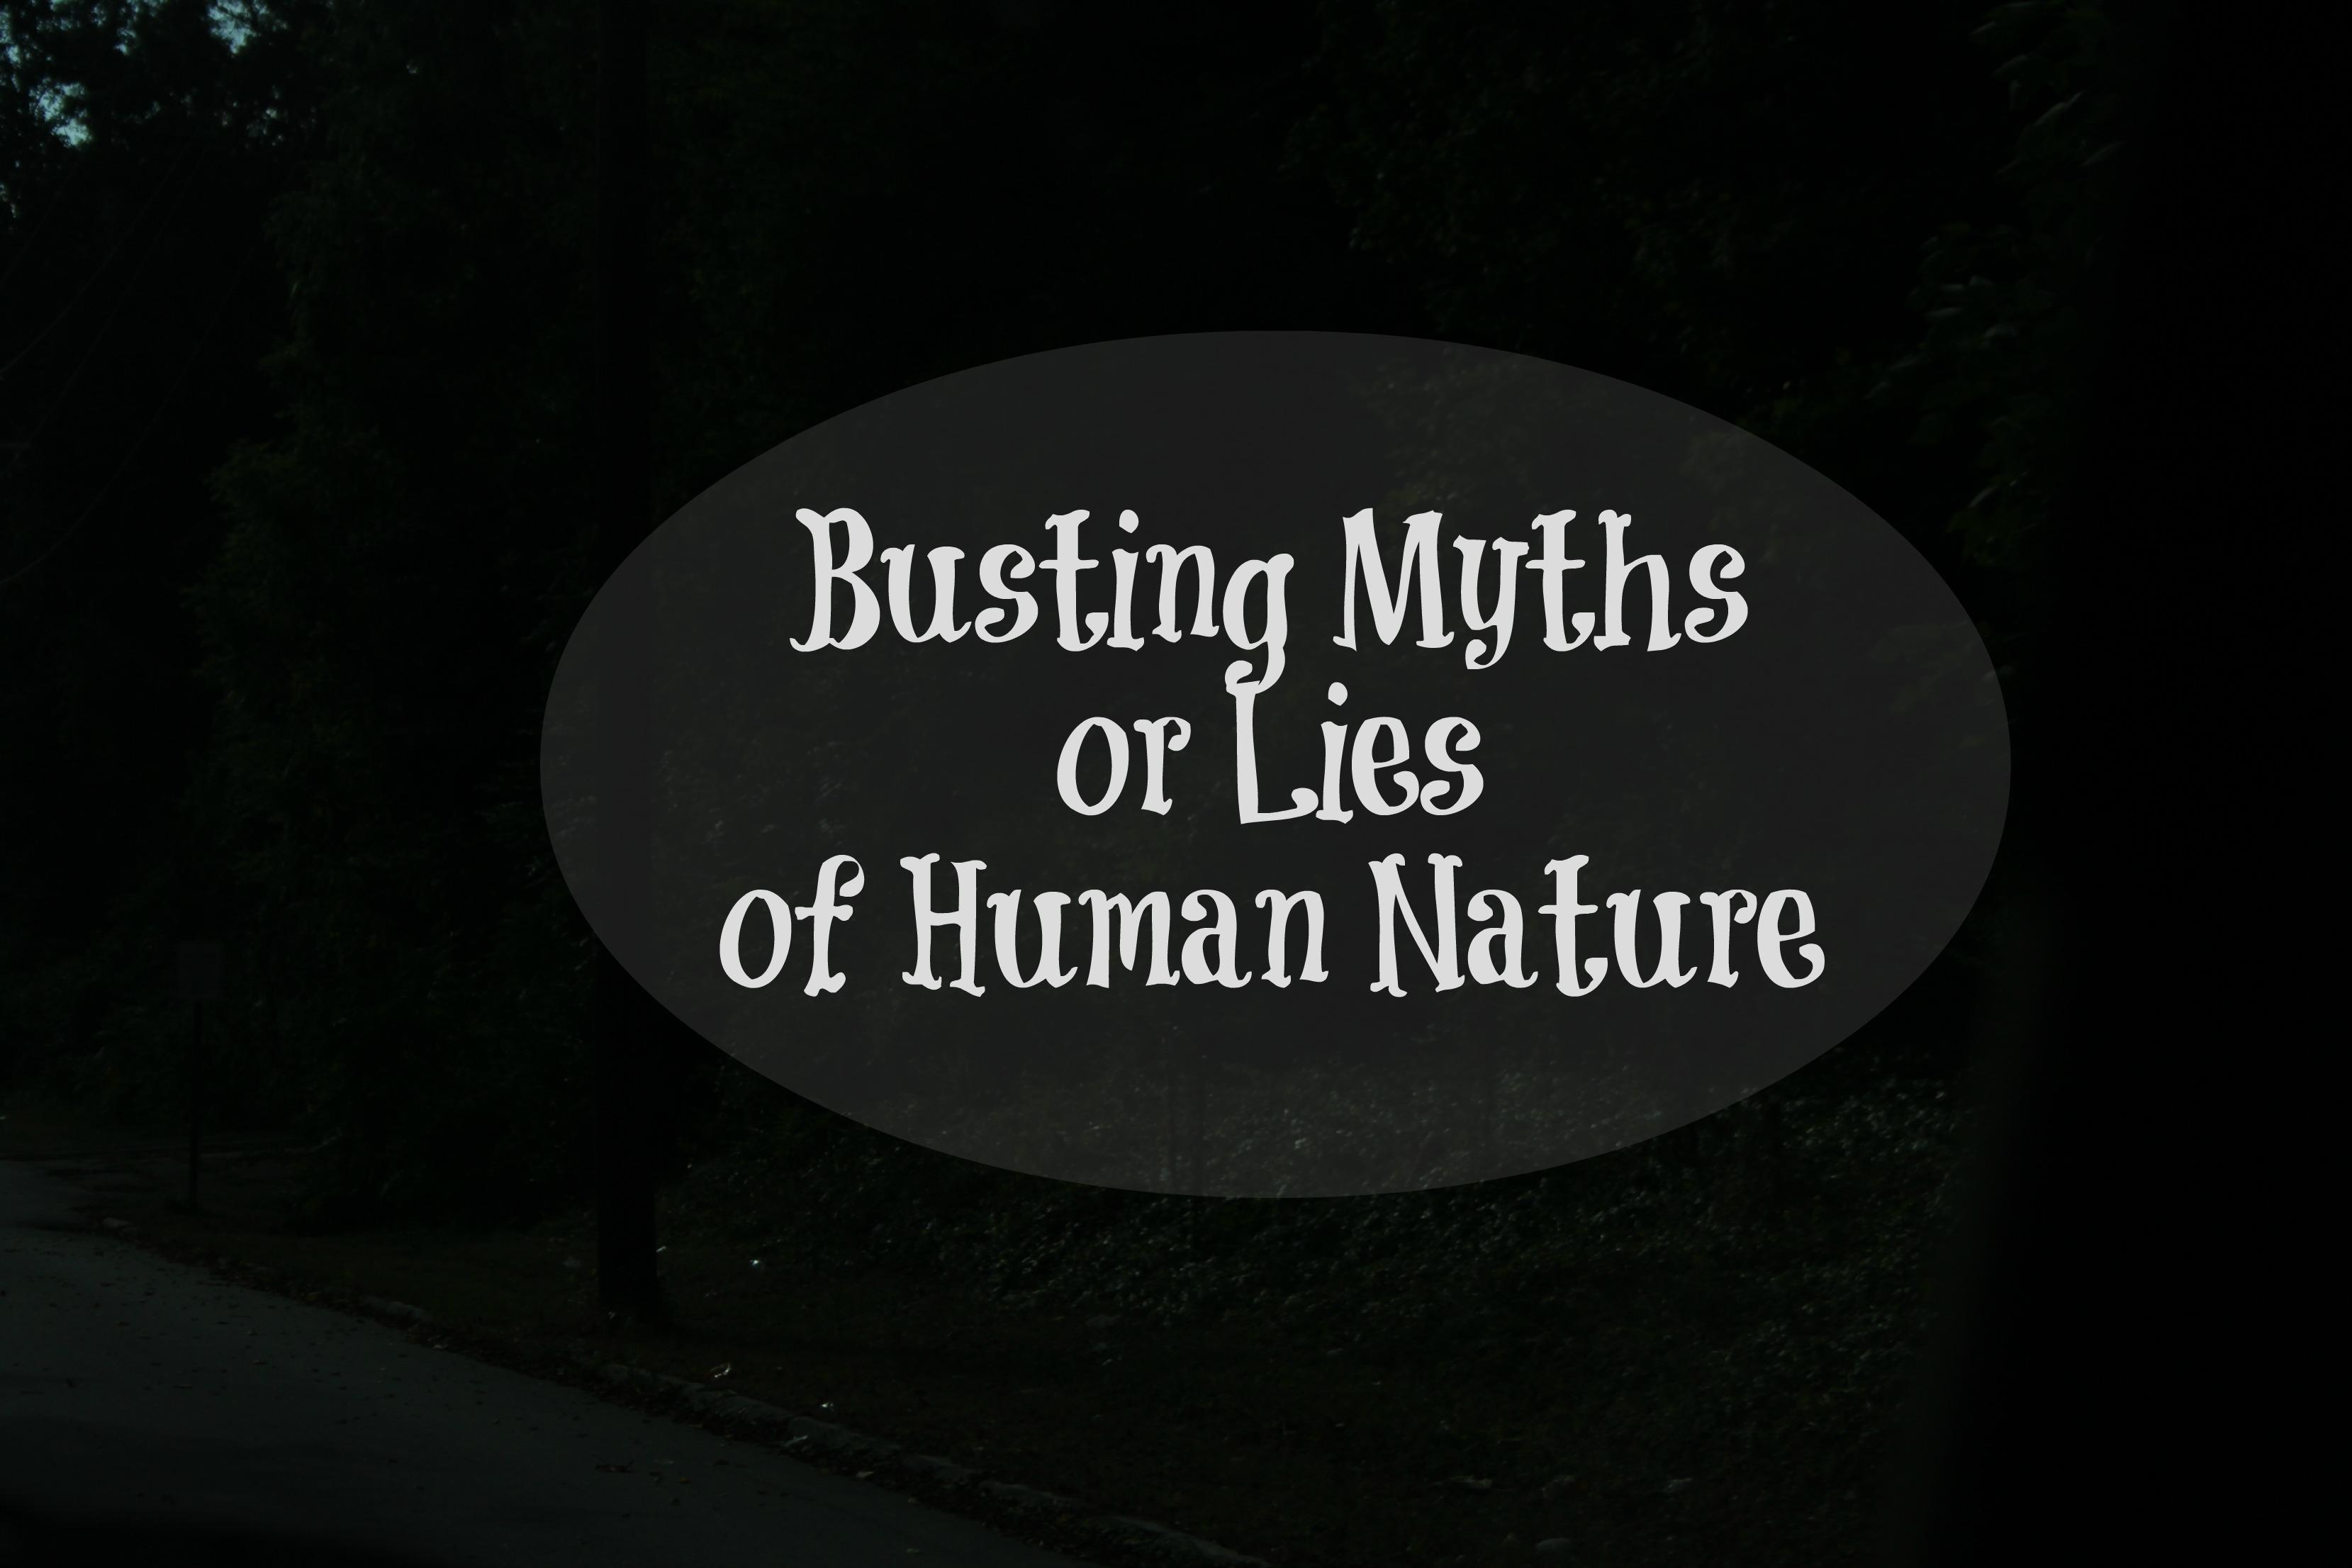 Busting Myths/Lies of Human Nature